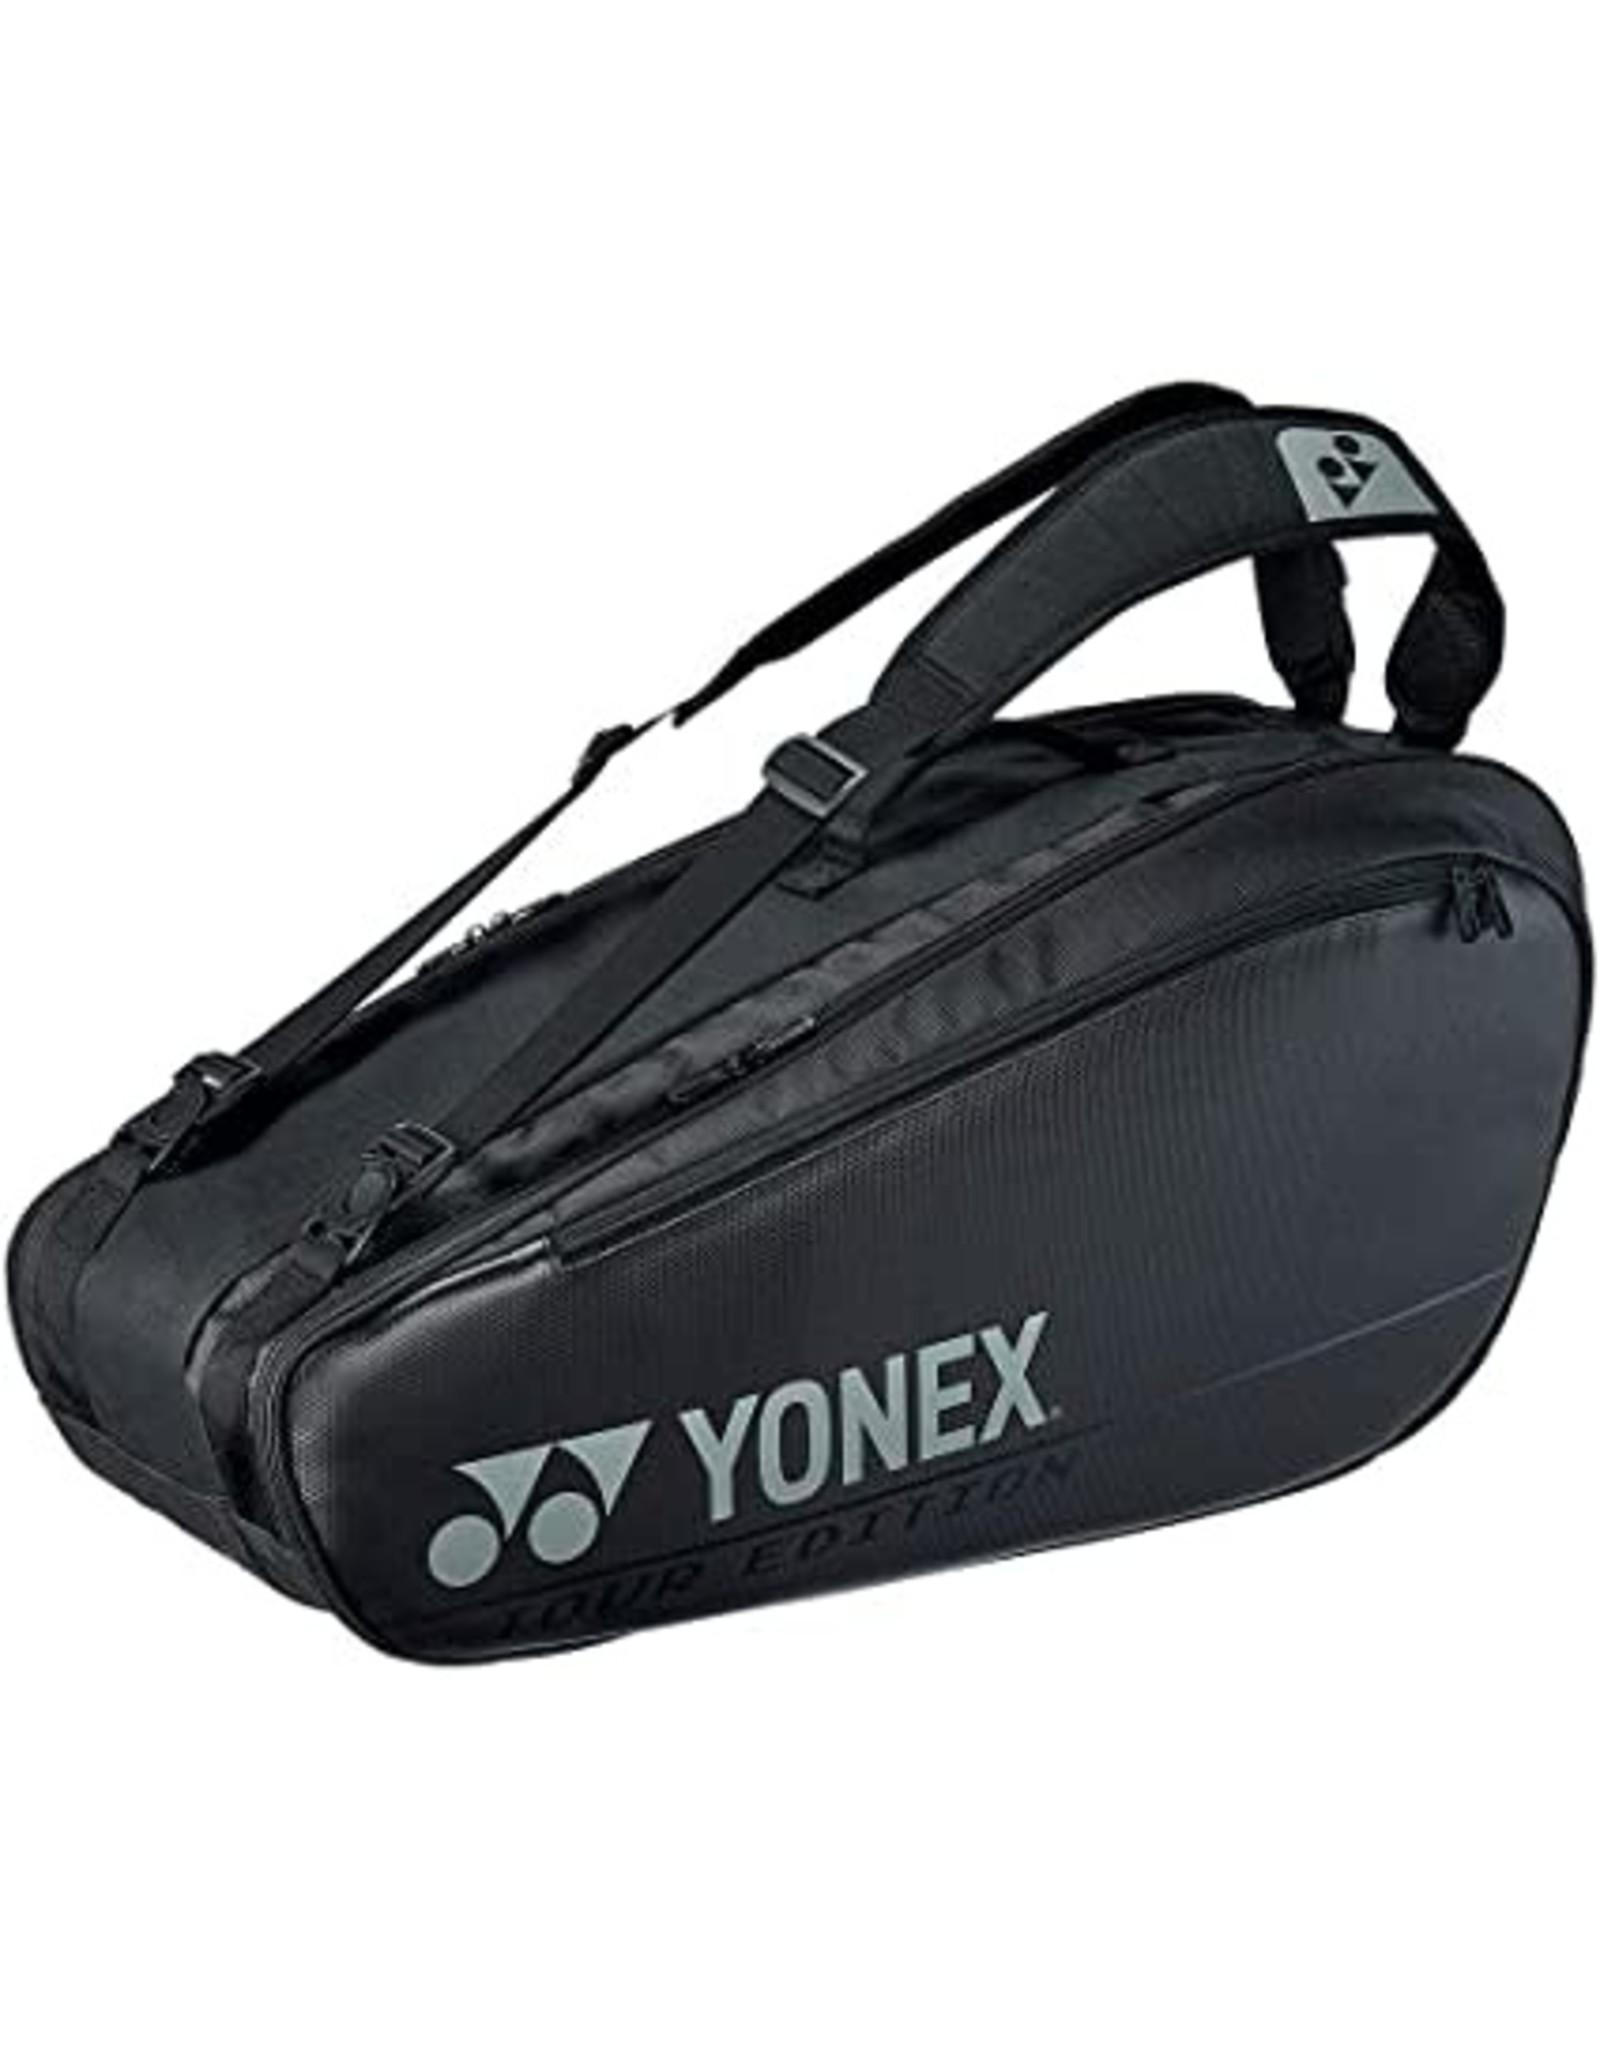 Yonex Pro Racquet Bag Black (6Pcs)